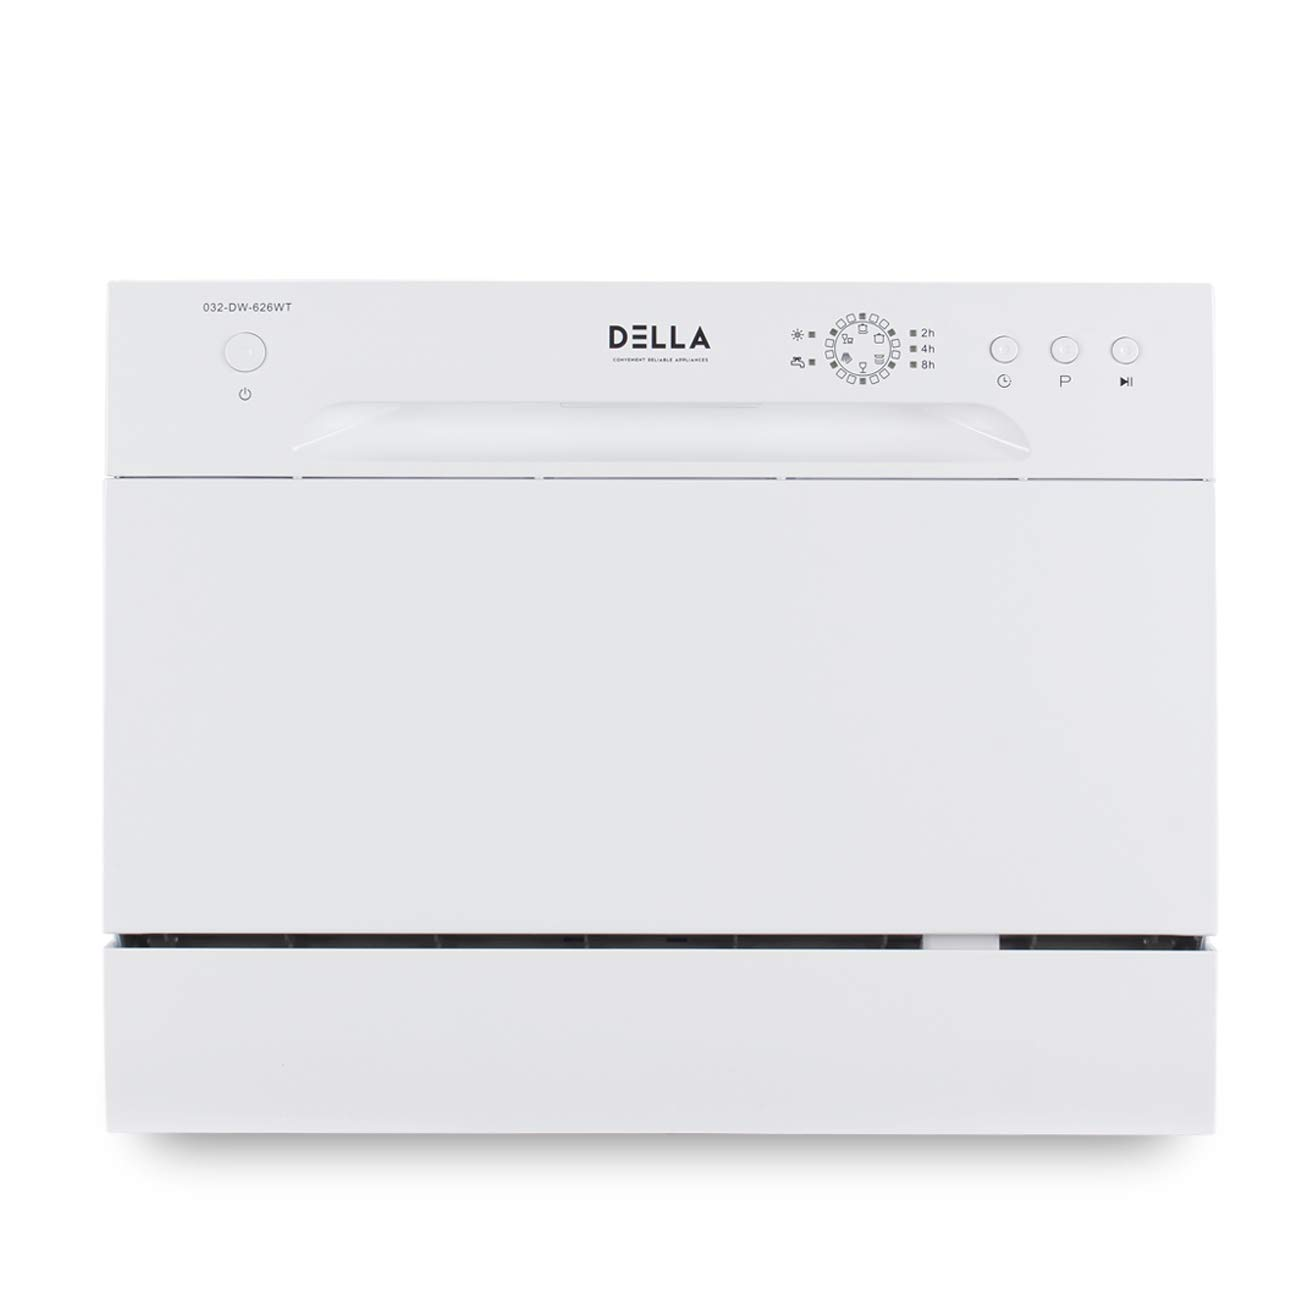 DELLA Mini Compact Countertop Dishwasher 6 Place Settings Portable For Small Apartment Home Kitchen, White